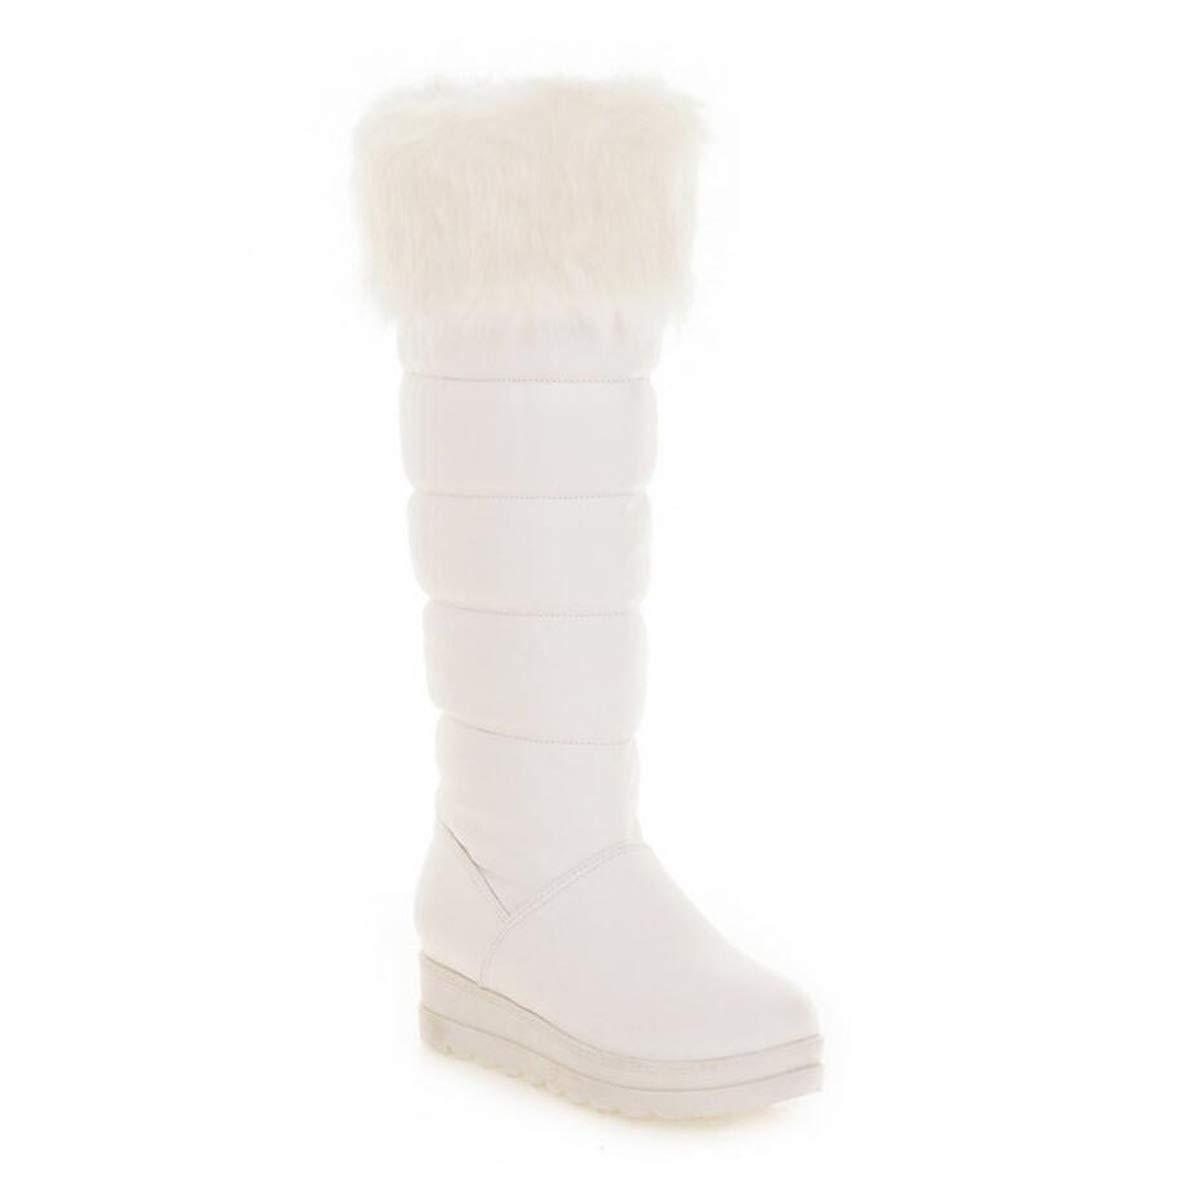 DANDANJIE Mädchen Winterstiefel Mode warme Schneeschuhe Damen weiche Wadenschuhe (Schwarz Weiß) Weiß 34EU